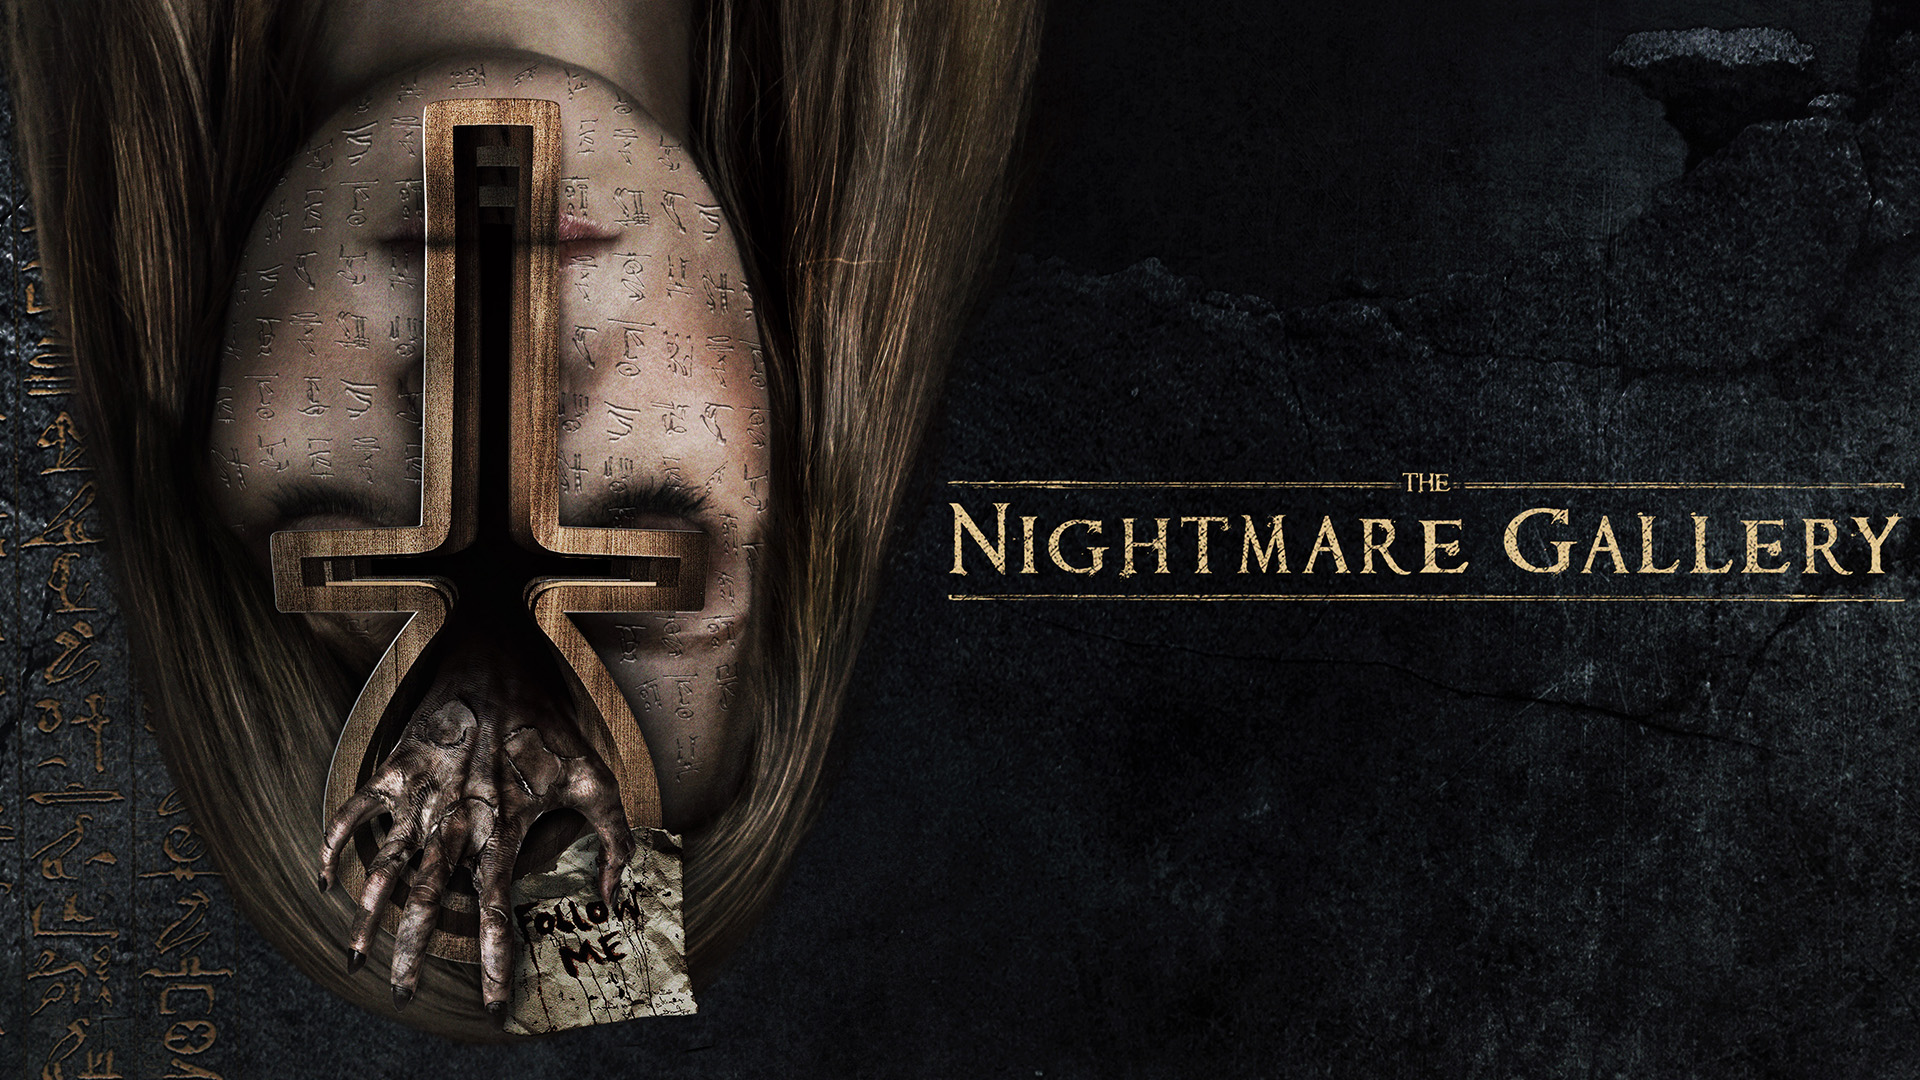 Nightmare Gallery, The